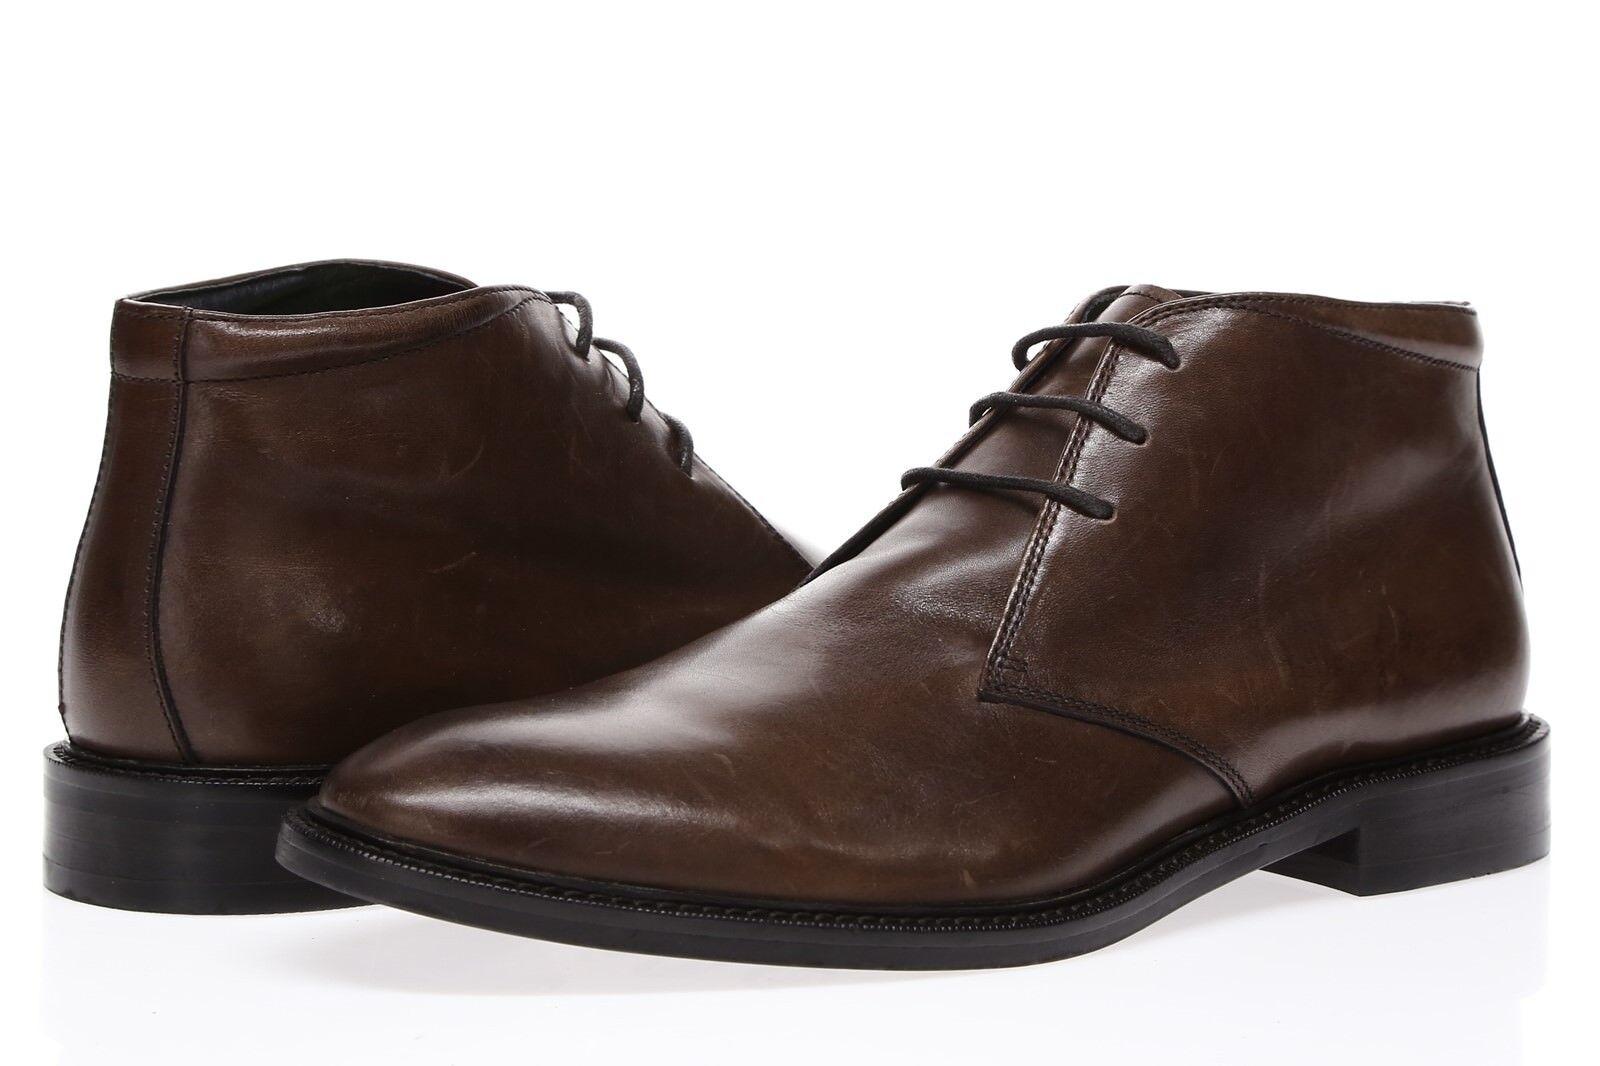 GORDON RUSH Mens 'Baylor' Brown Leather Chukka Boots Sz 9 - 231037